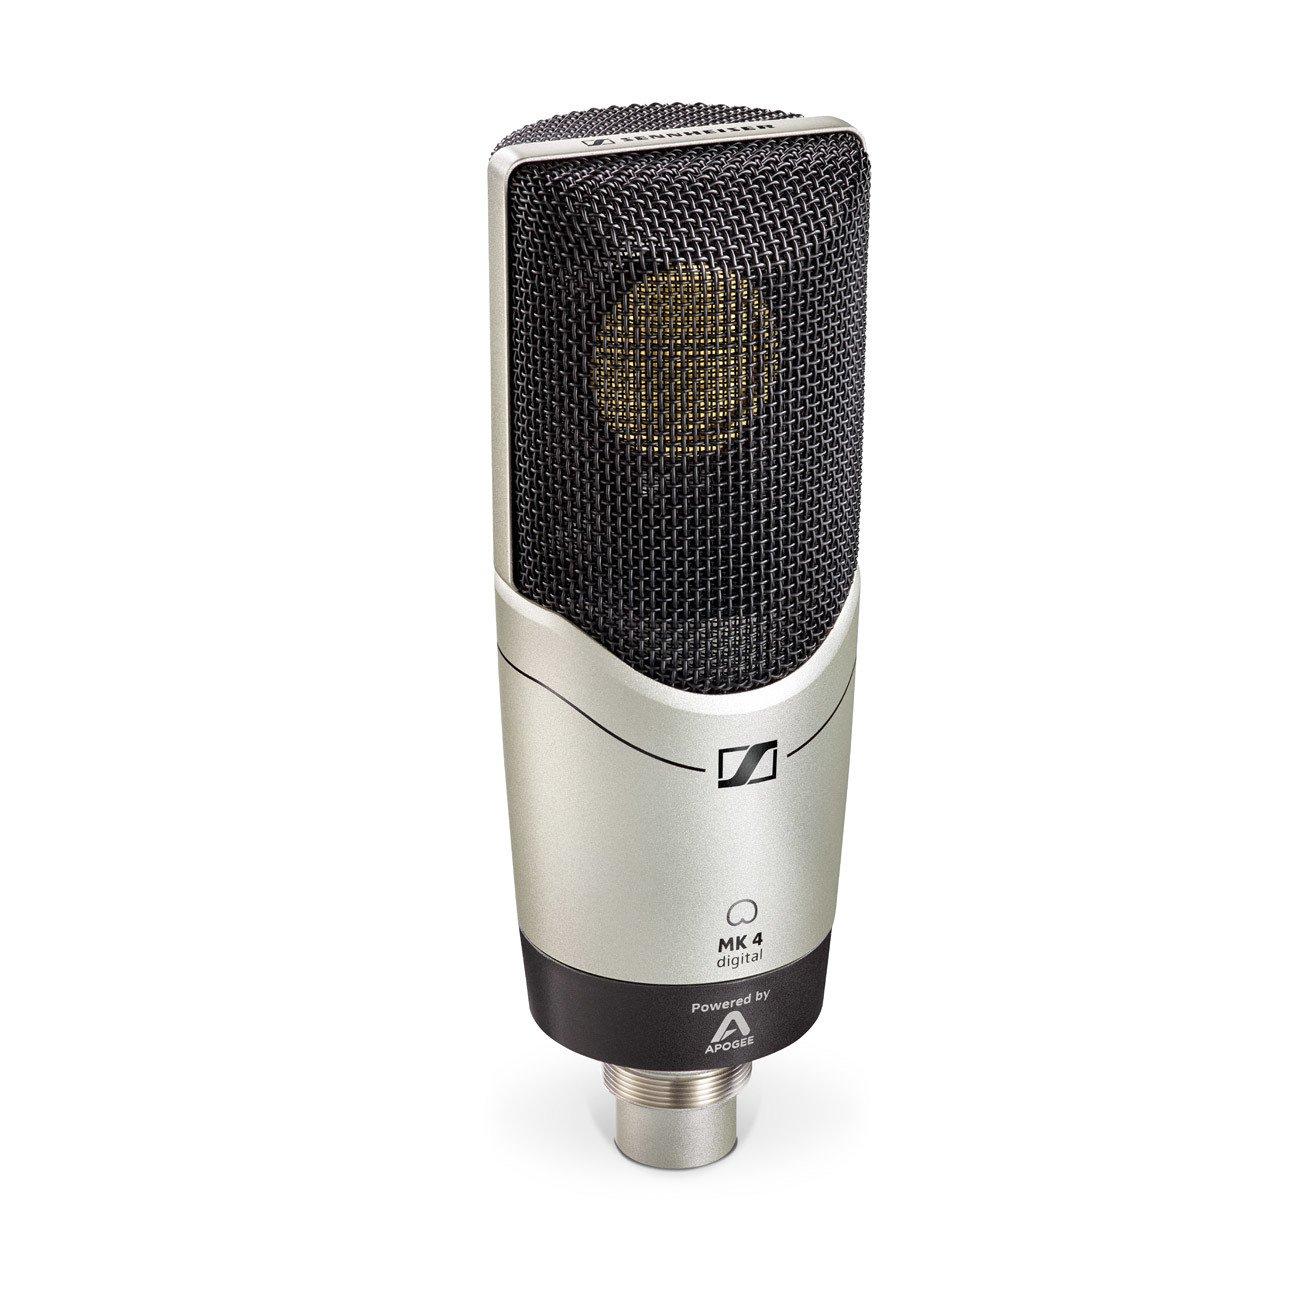 Sennheiser MK 4 digital Condenser Microphone